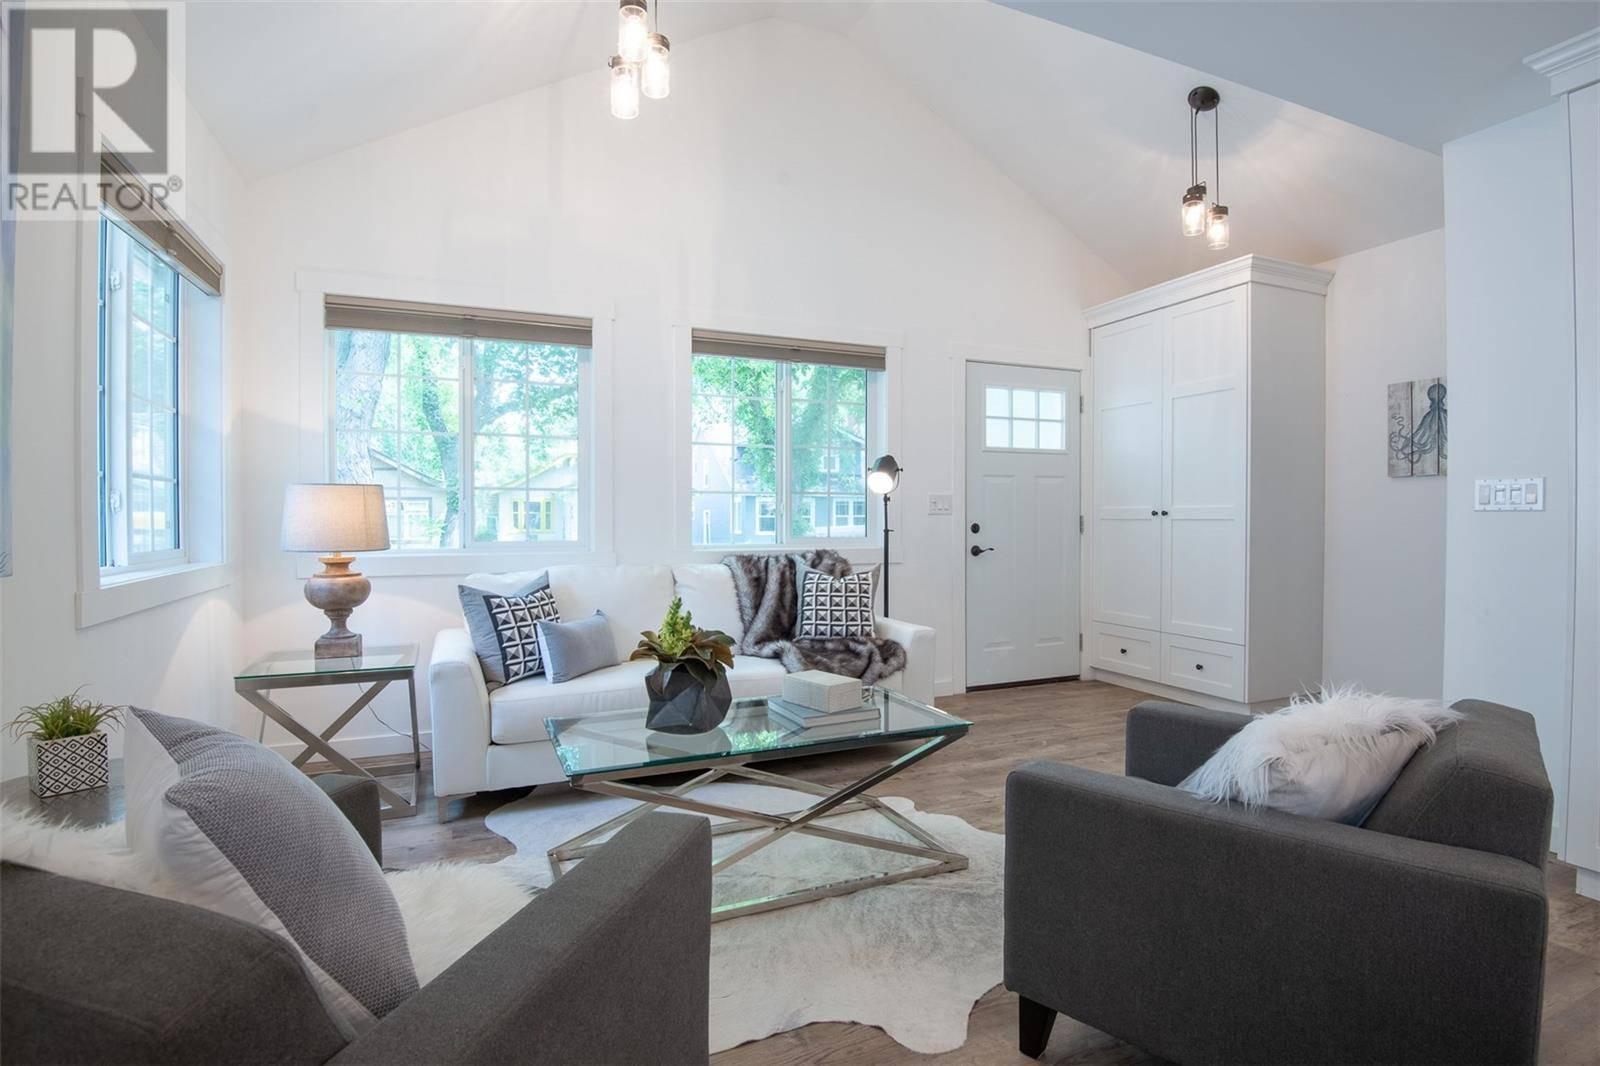 House for sale at 717 4th Ave N Saskatoon Saskatchewan - MLS: SK783743